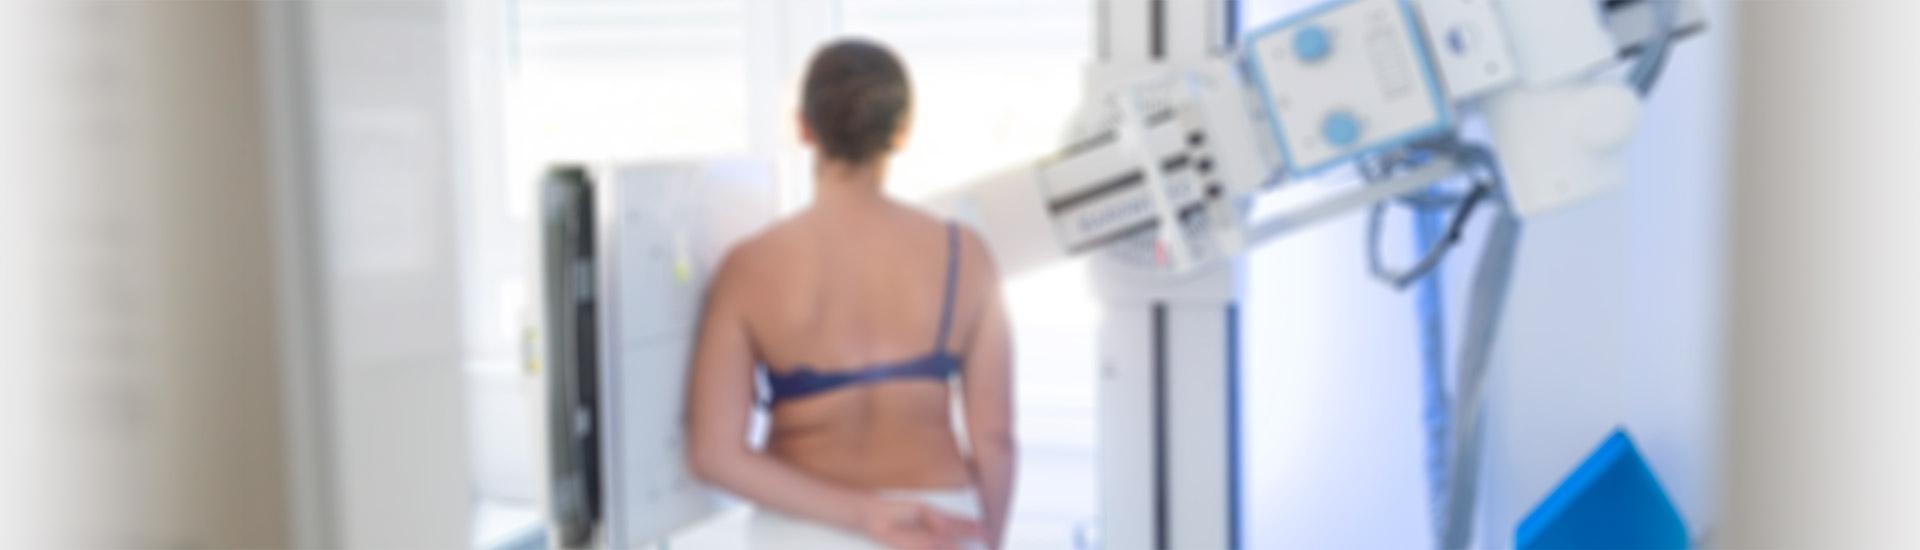 Orthopraxis München-Gräfelfing